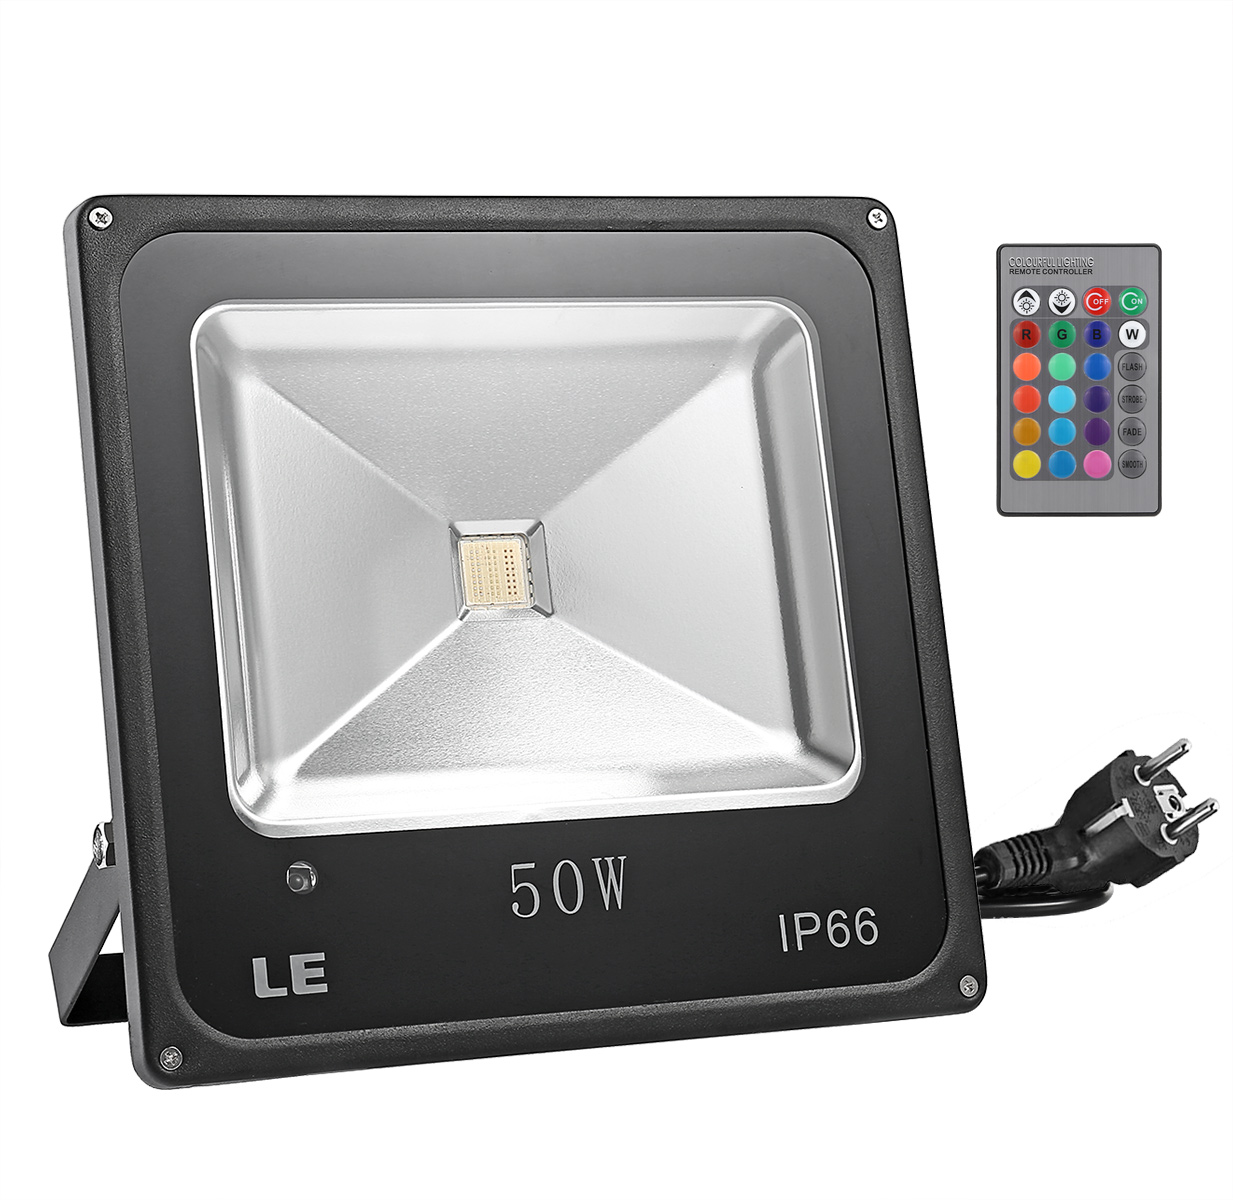 50W LED RGB Strahler, fernbedient Fluter, 16 Farben & 4 Modi, Wasserdicht, Farbwechsel